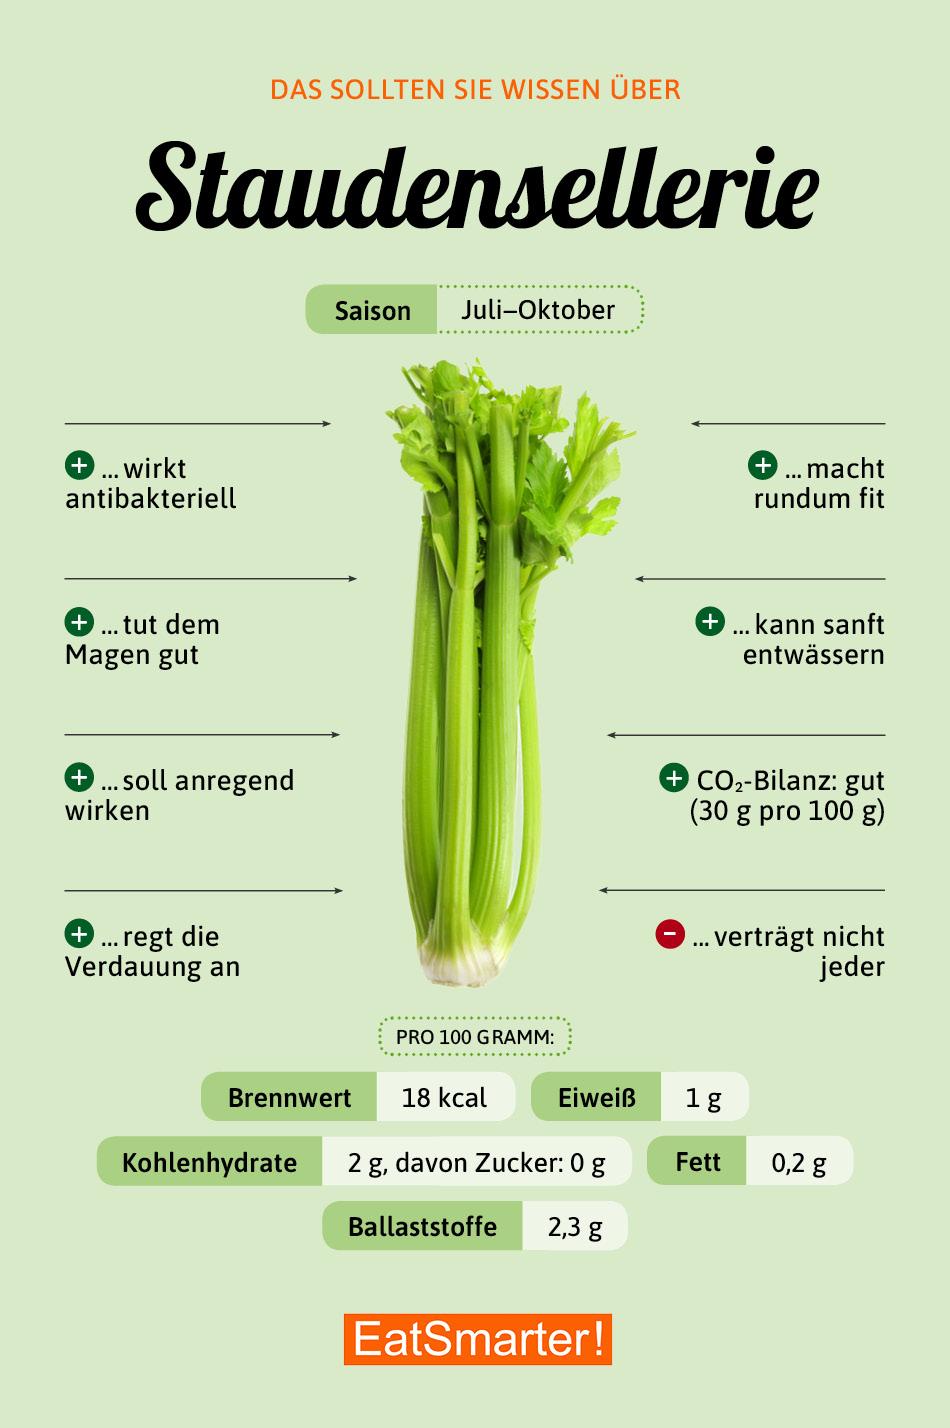 Infografik Staudensellerie